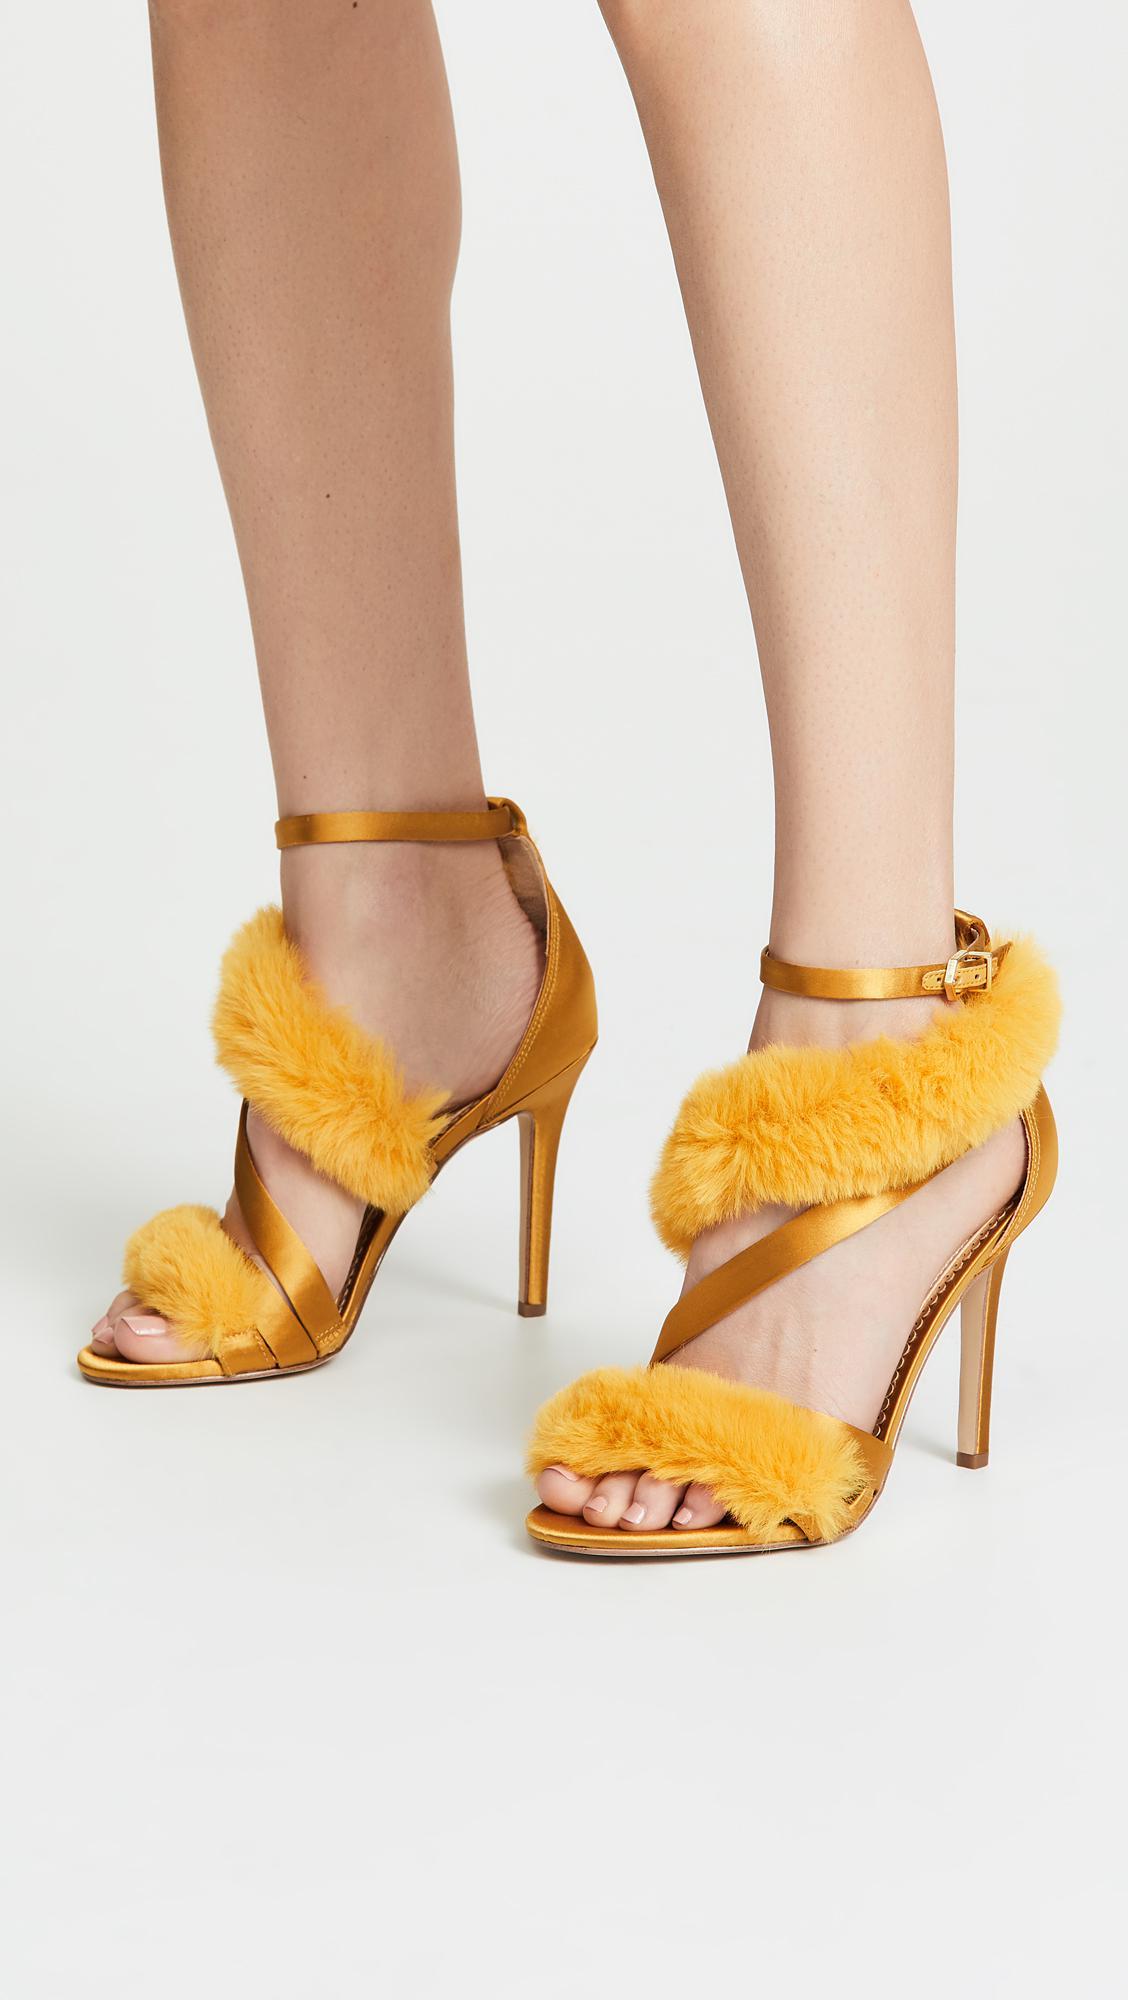 f1bceea65ed5 Lyst - Sam Edelman Adelle Sandals in Yellow